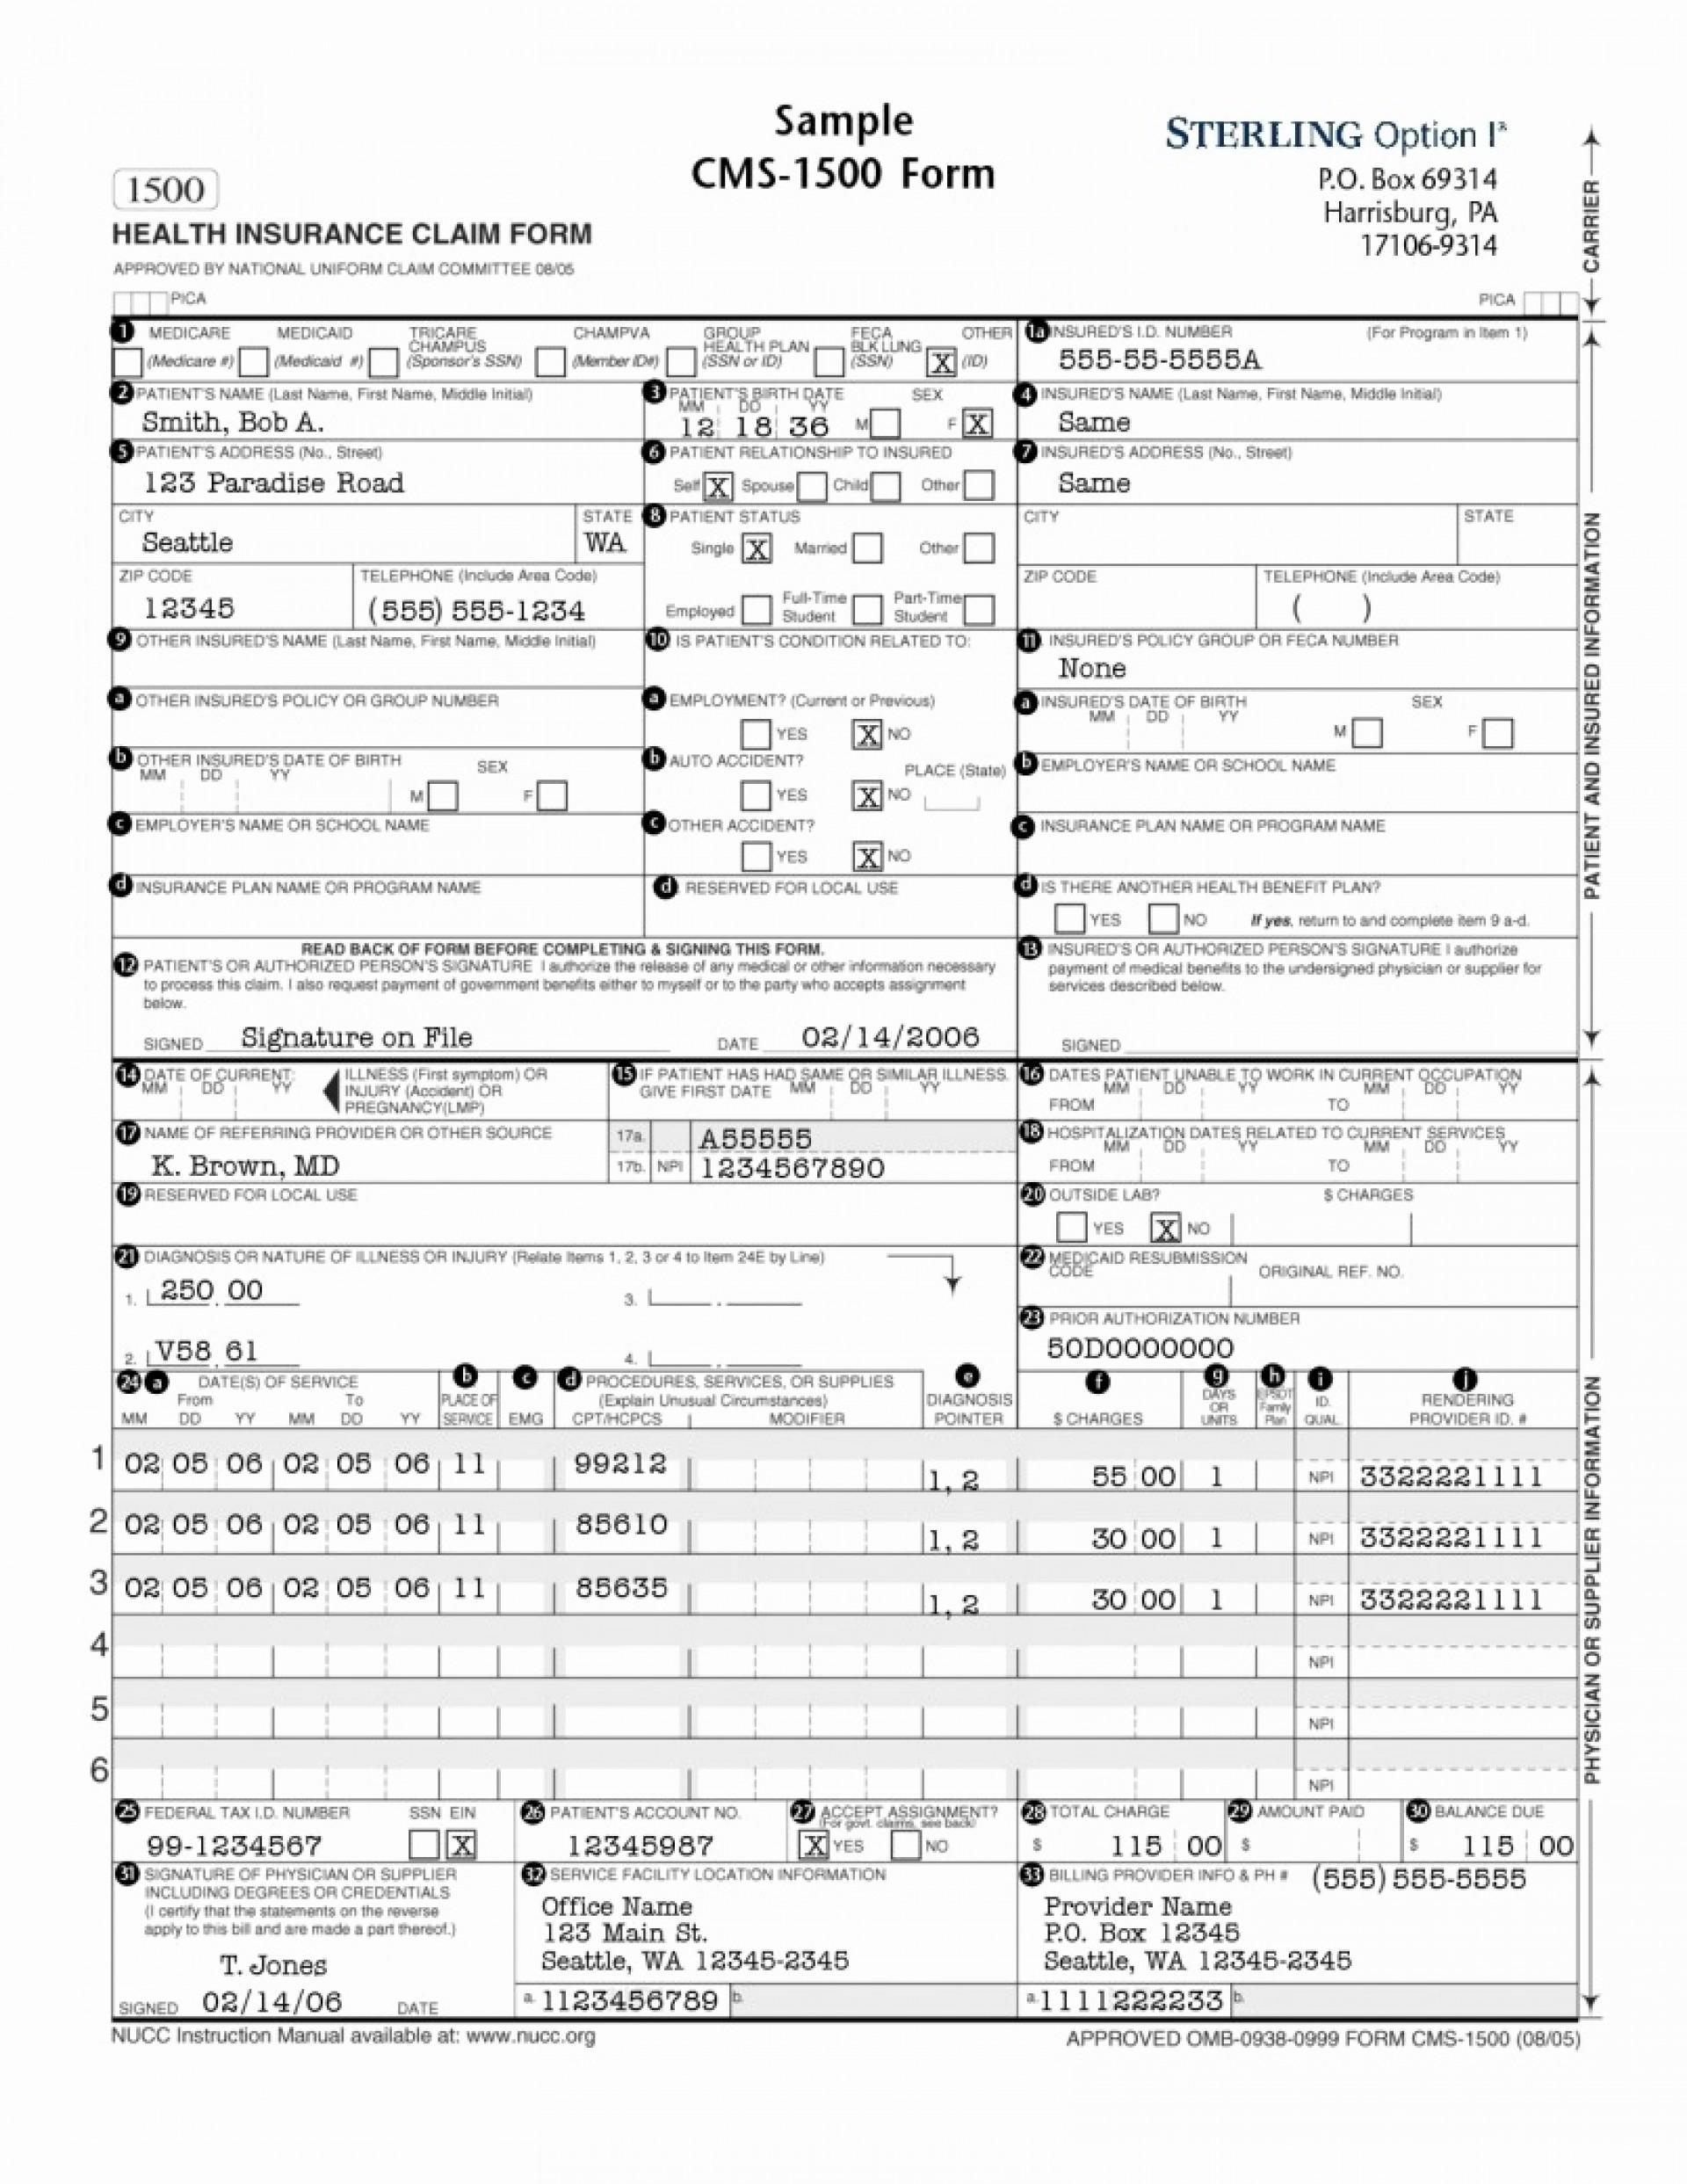 Cms 1500 Form 0212 Free